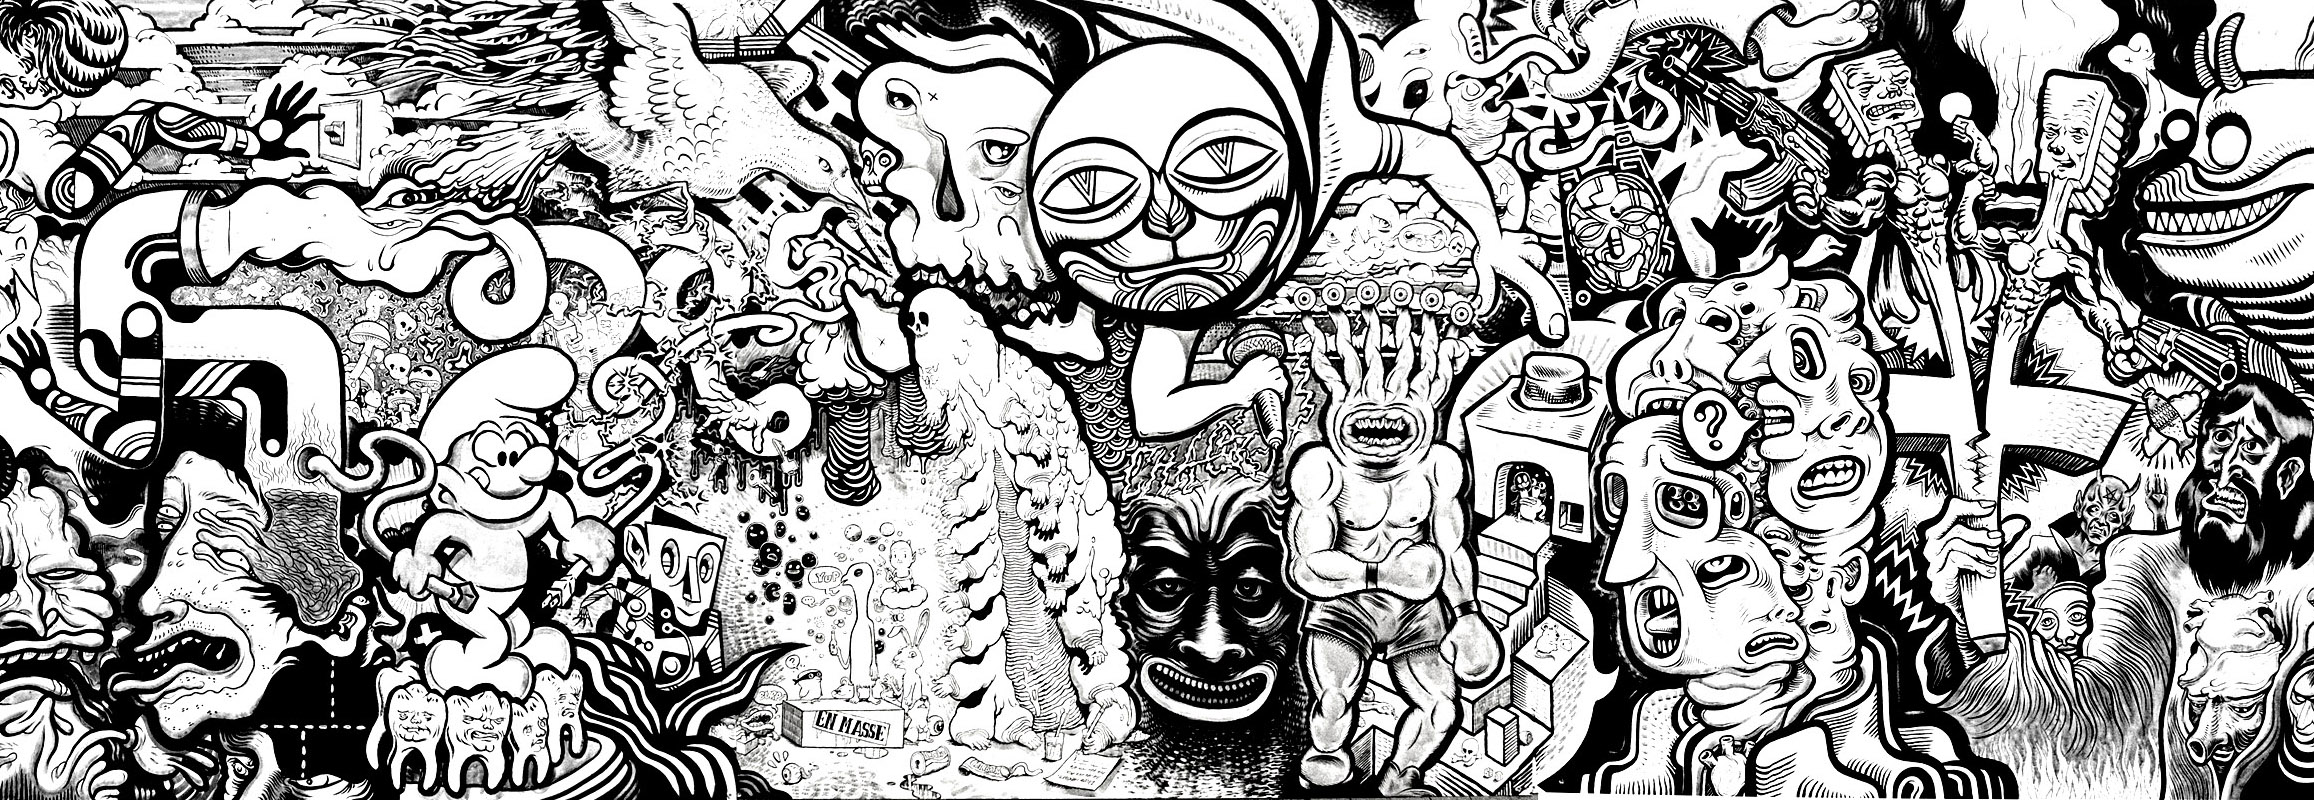 Graffiti strassenkunst 15014 - Graffiti / Straßenkunst - Malbuch Fur ...